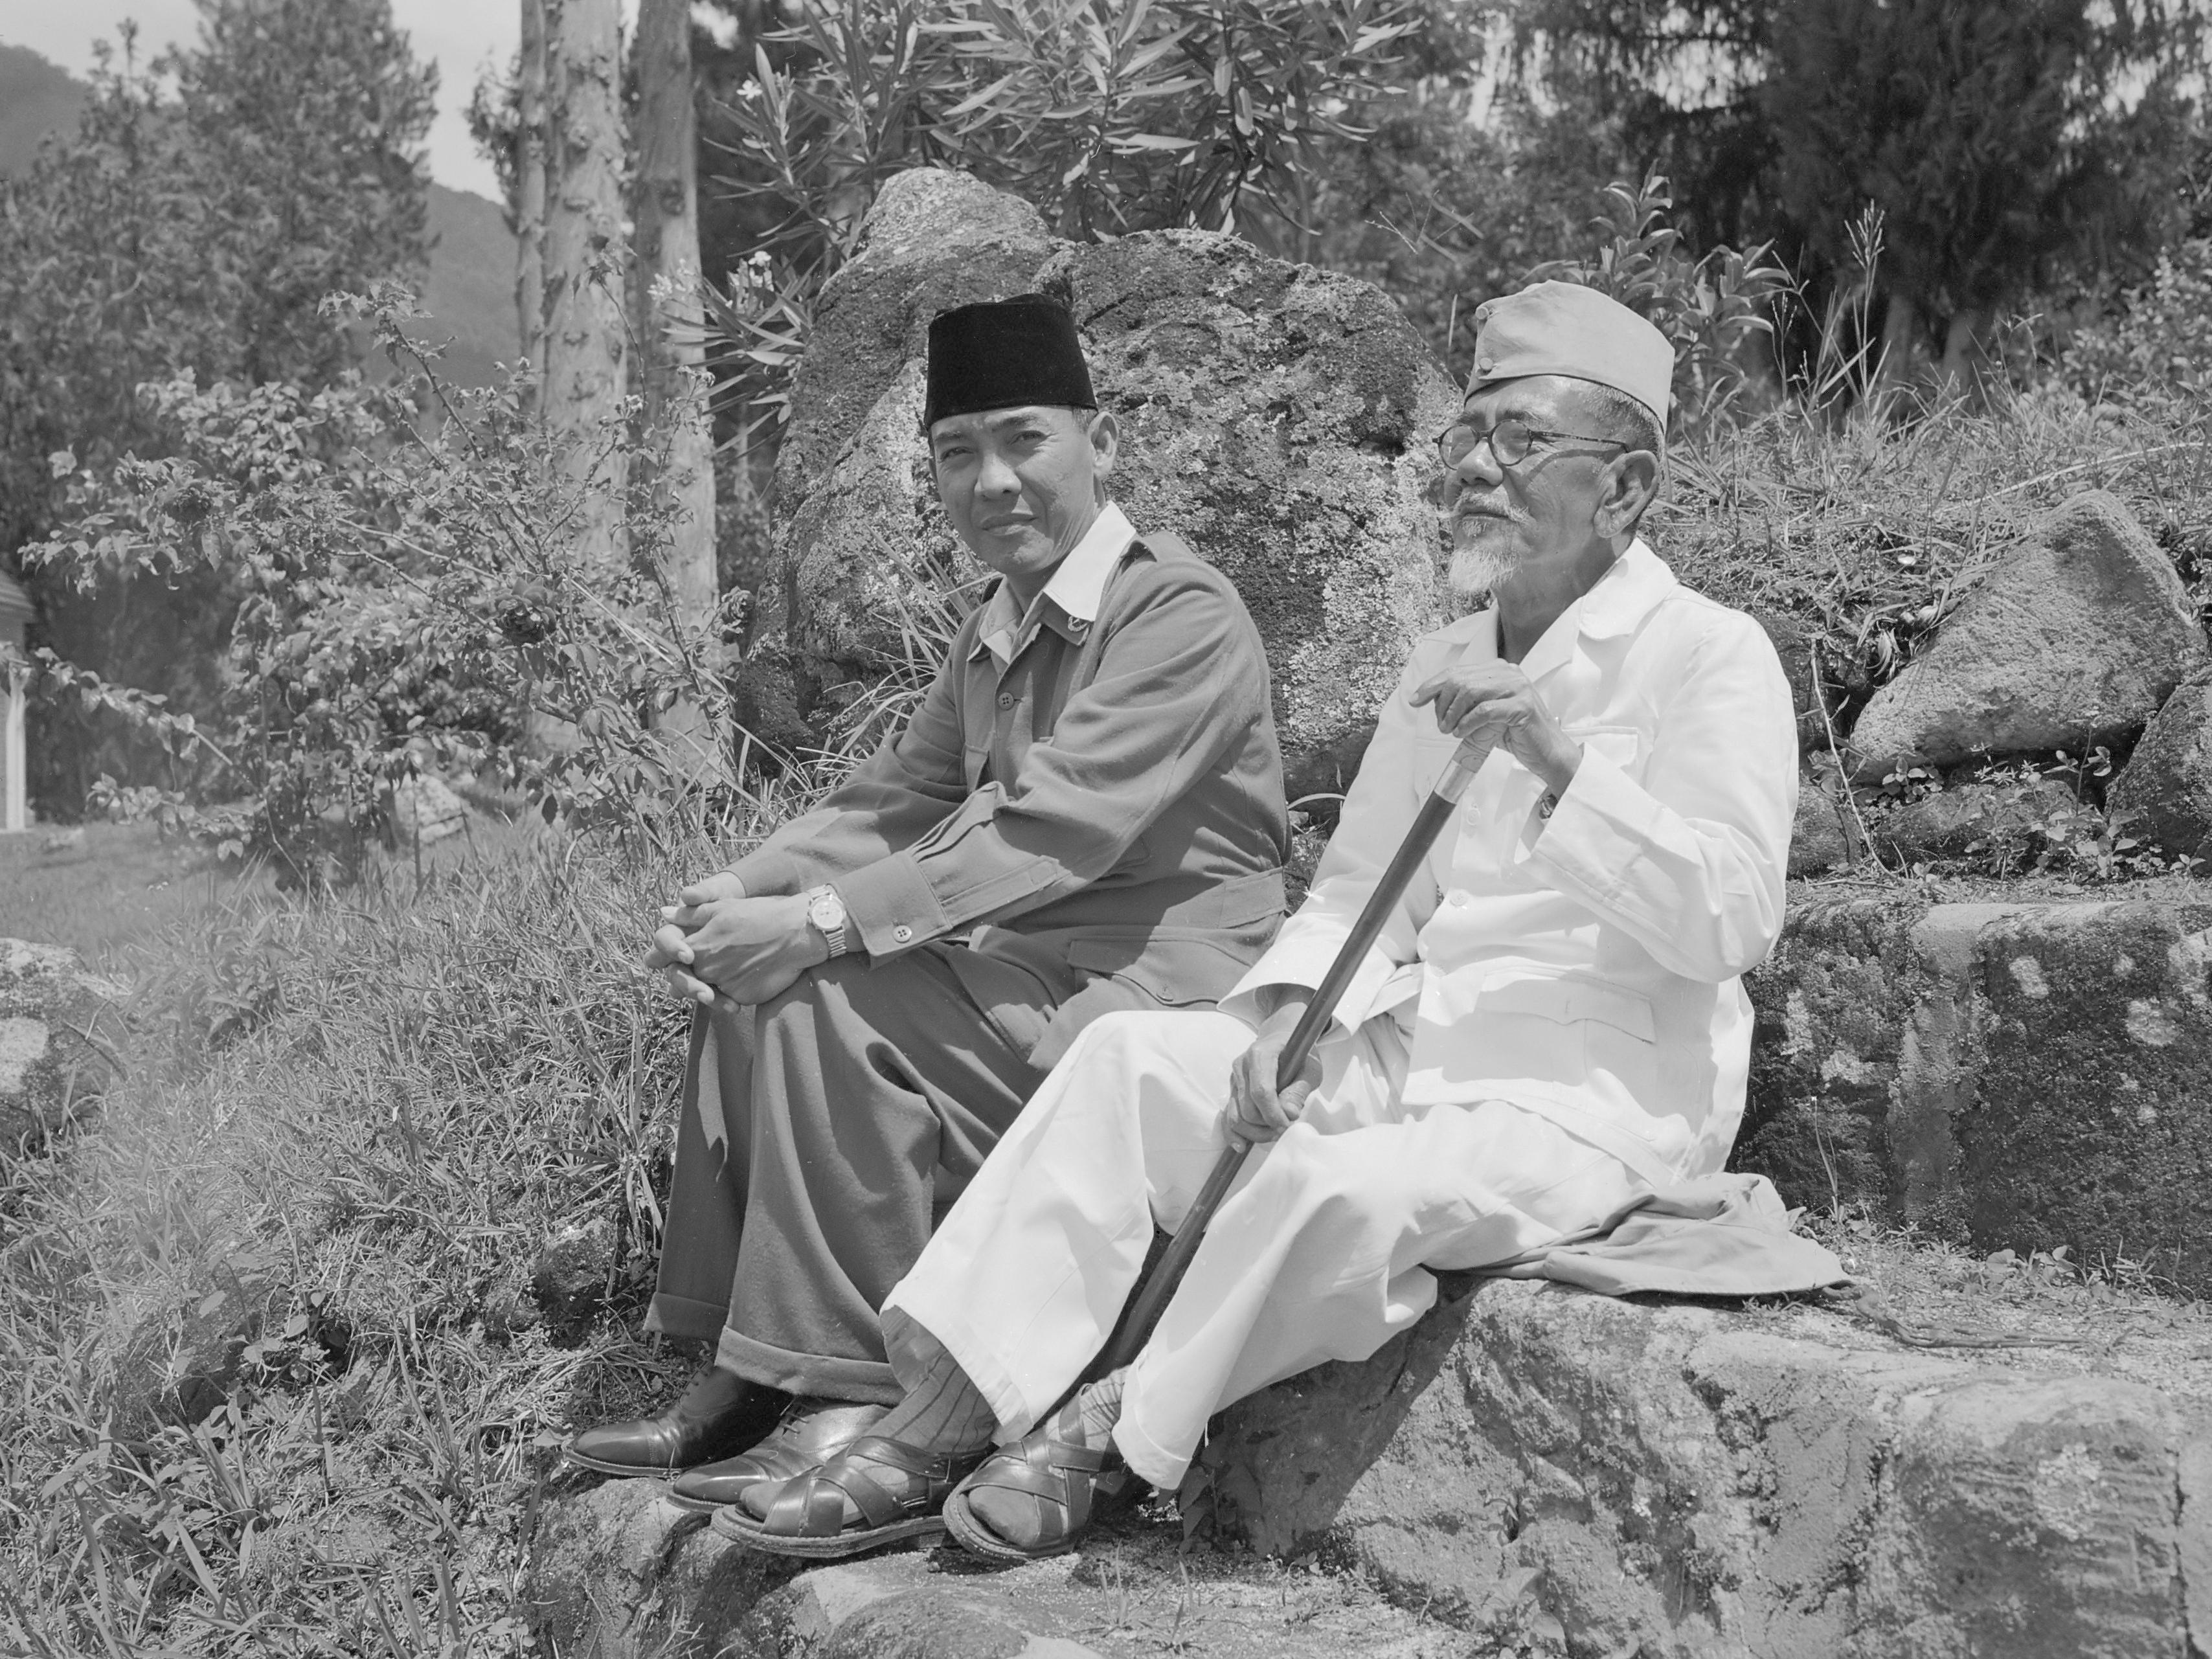 https://i2.wp.com/upload.wikimedia.org/wikipedia/commons/1/1e/COLLECTIE_TROPENMUSEUM_President_Soekarno_tijdens_een_wandeling_met_Hadji_Agus_Salim_TMnr_10018810.jpg